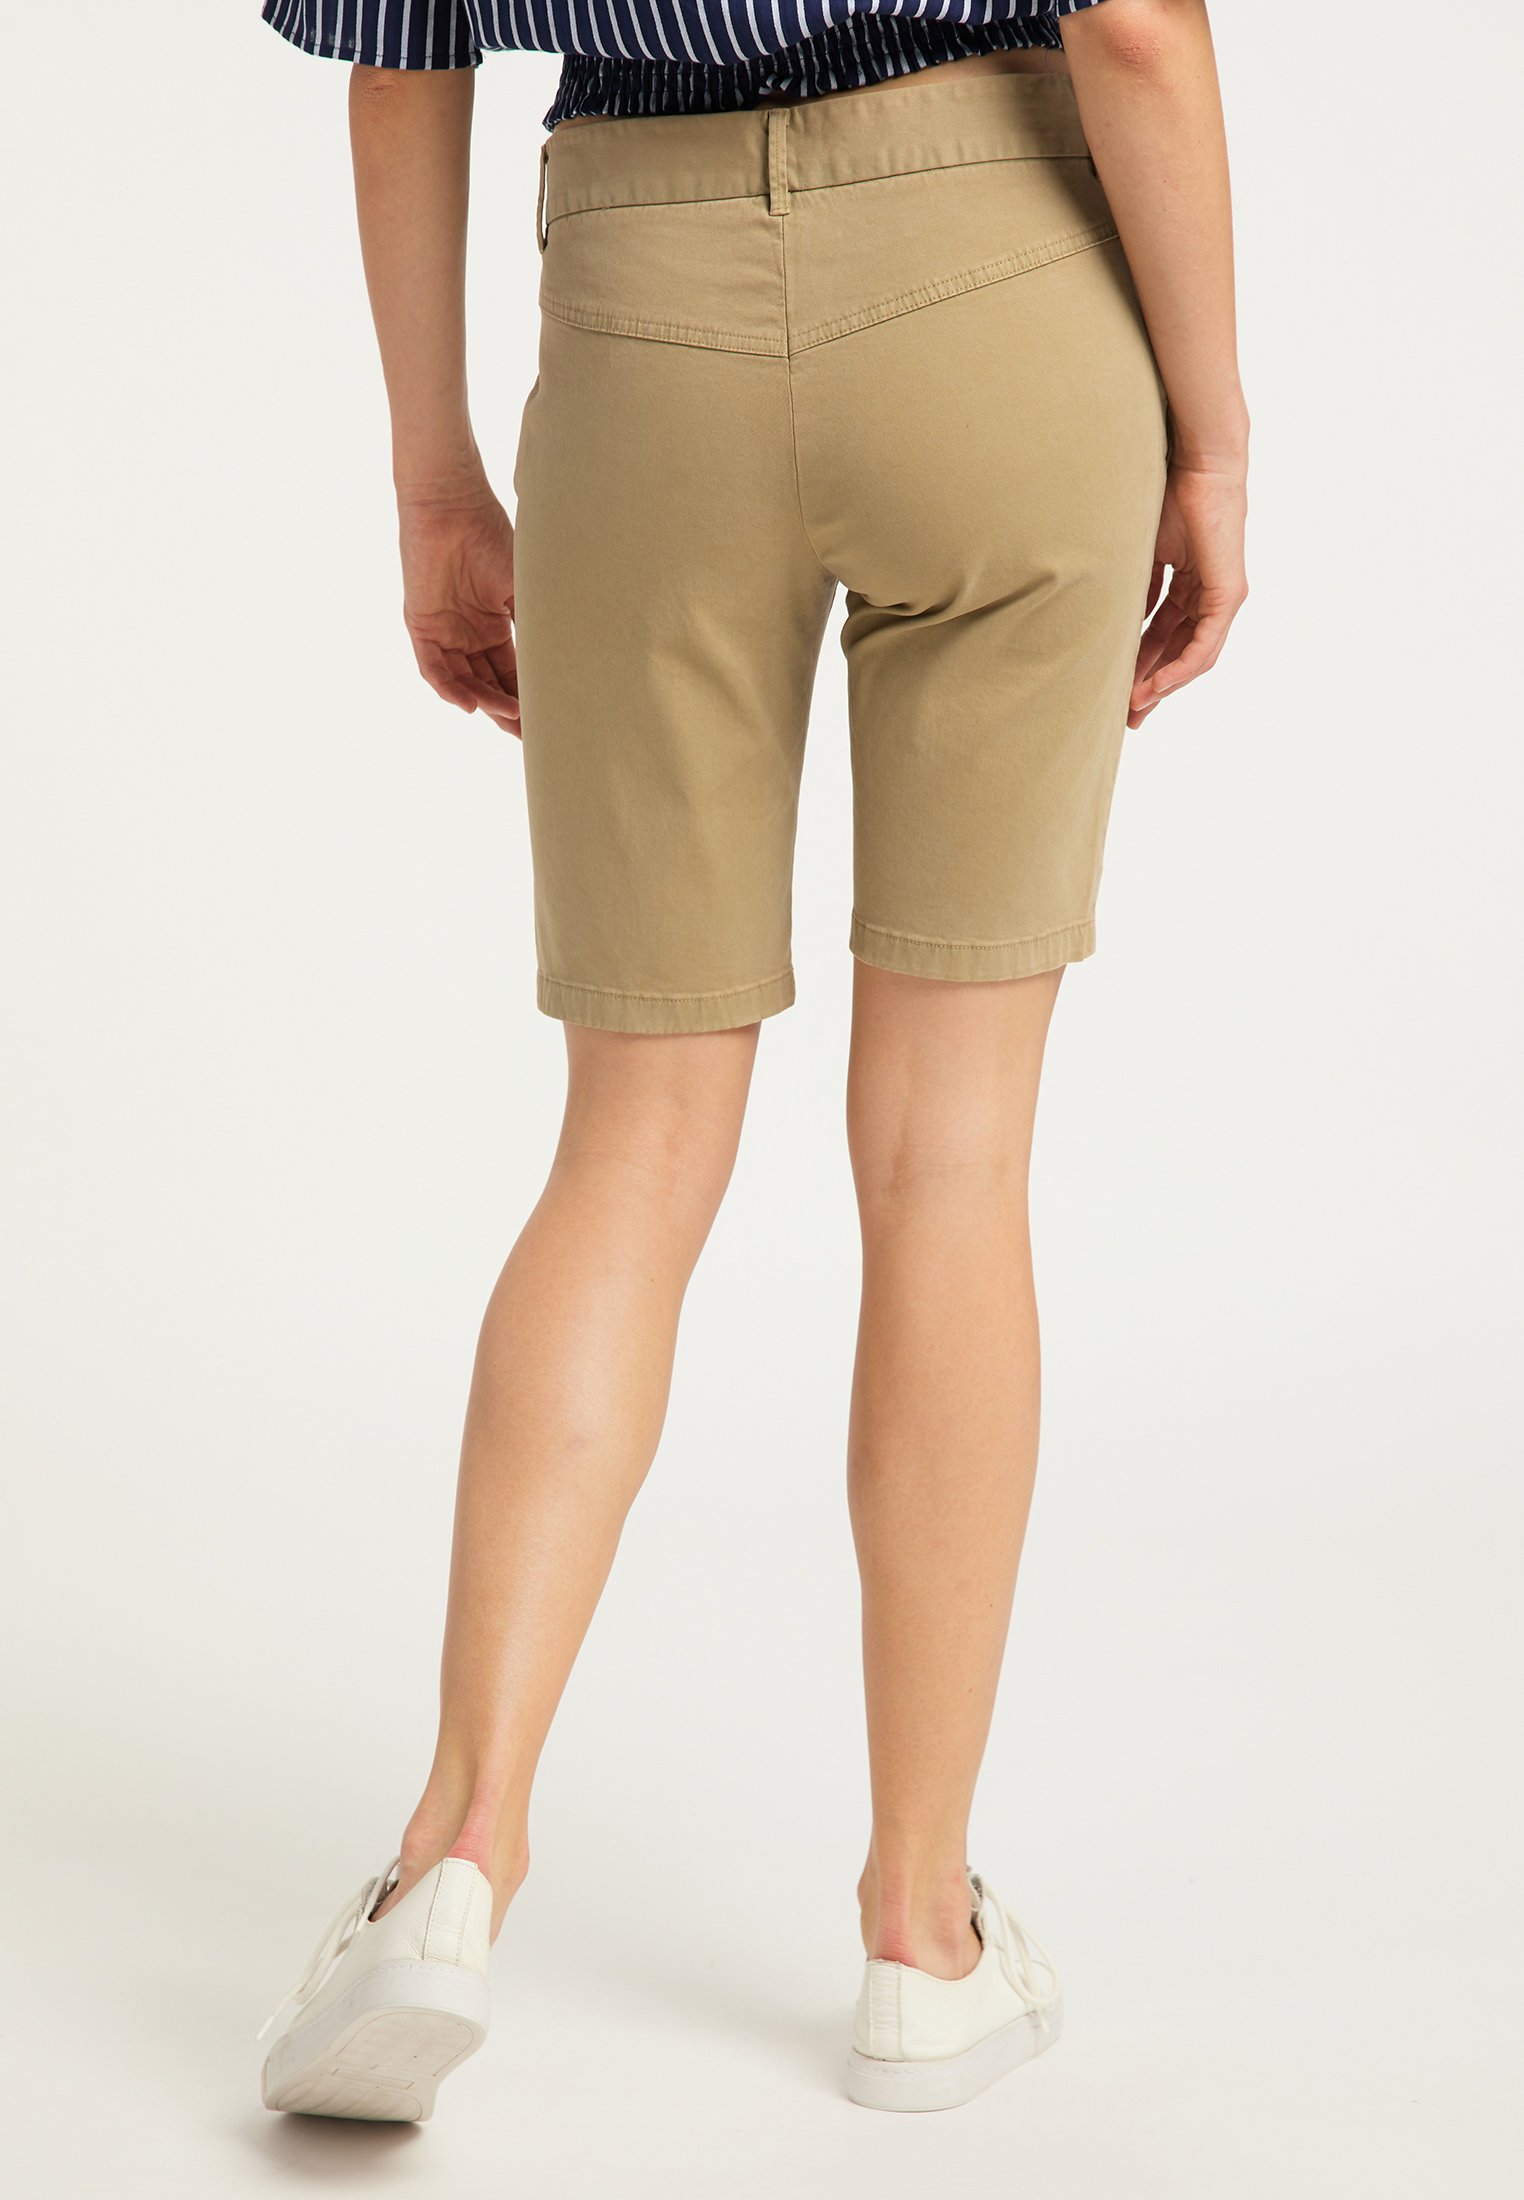 Cheapest Women's Clothing DreiMaster Shorts beige nbbZKg46w